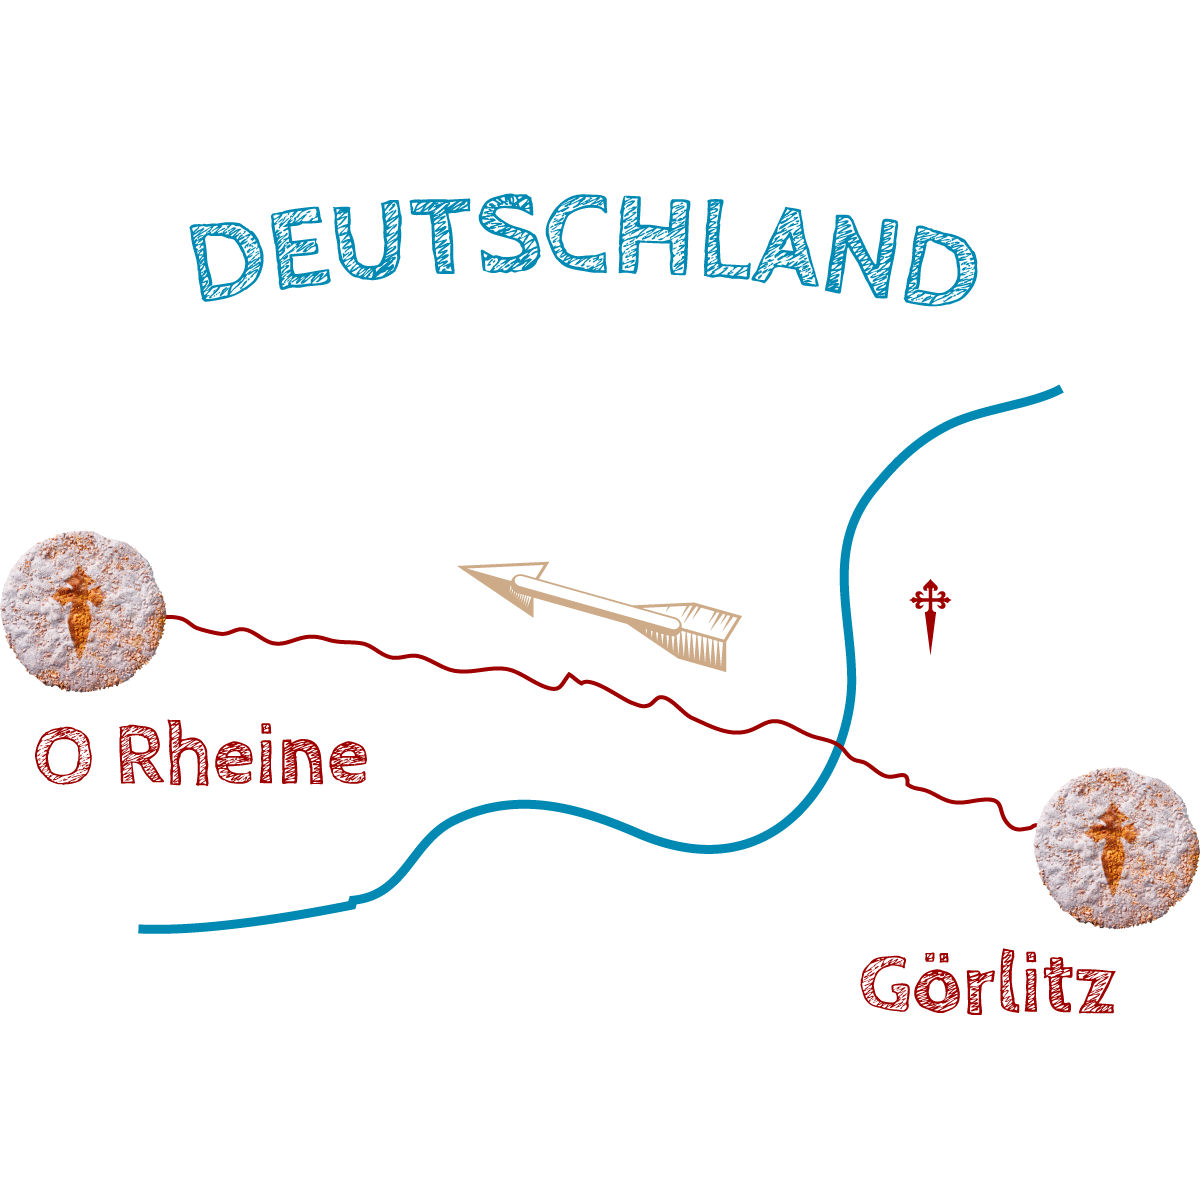 Wegegrafik-O-Rheine-Görlitz